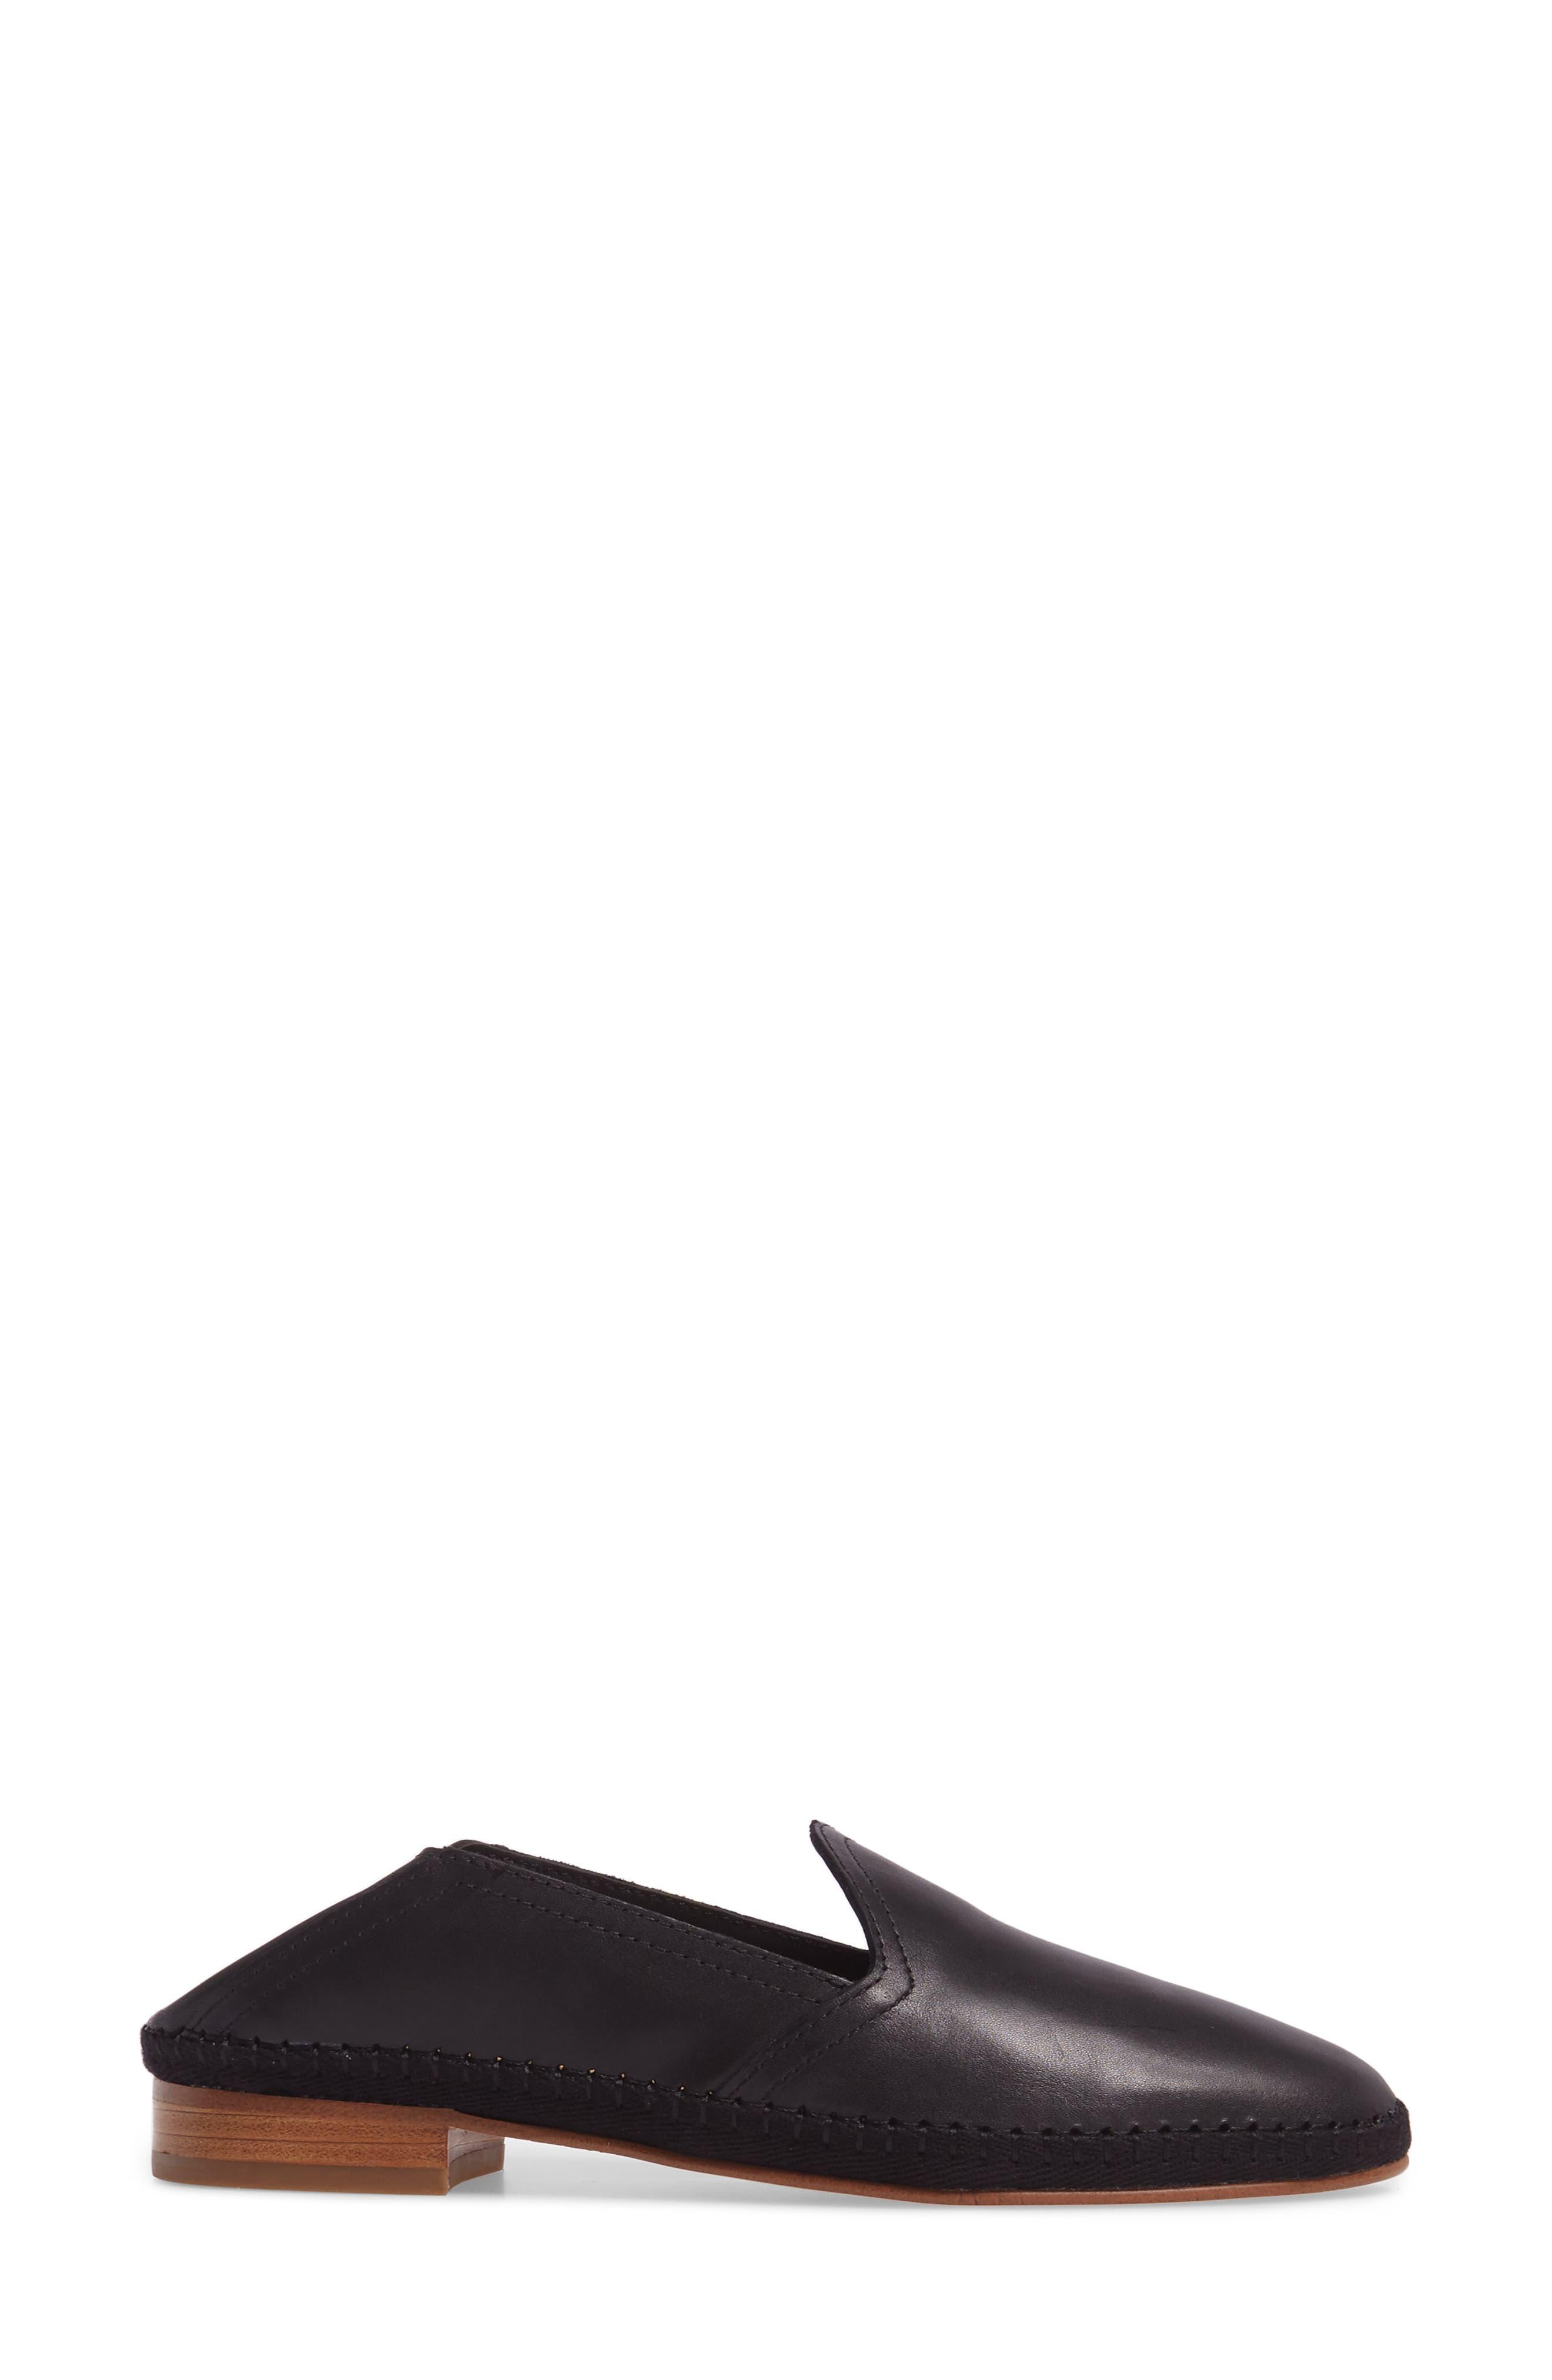 Soludus Convertible Venetian Loafer,                             Alternate thumbnail 2, color,                             001